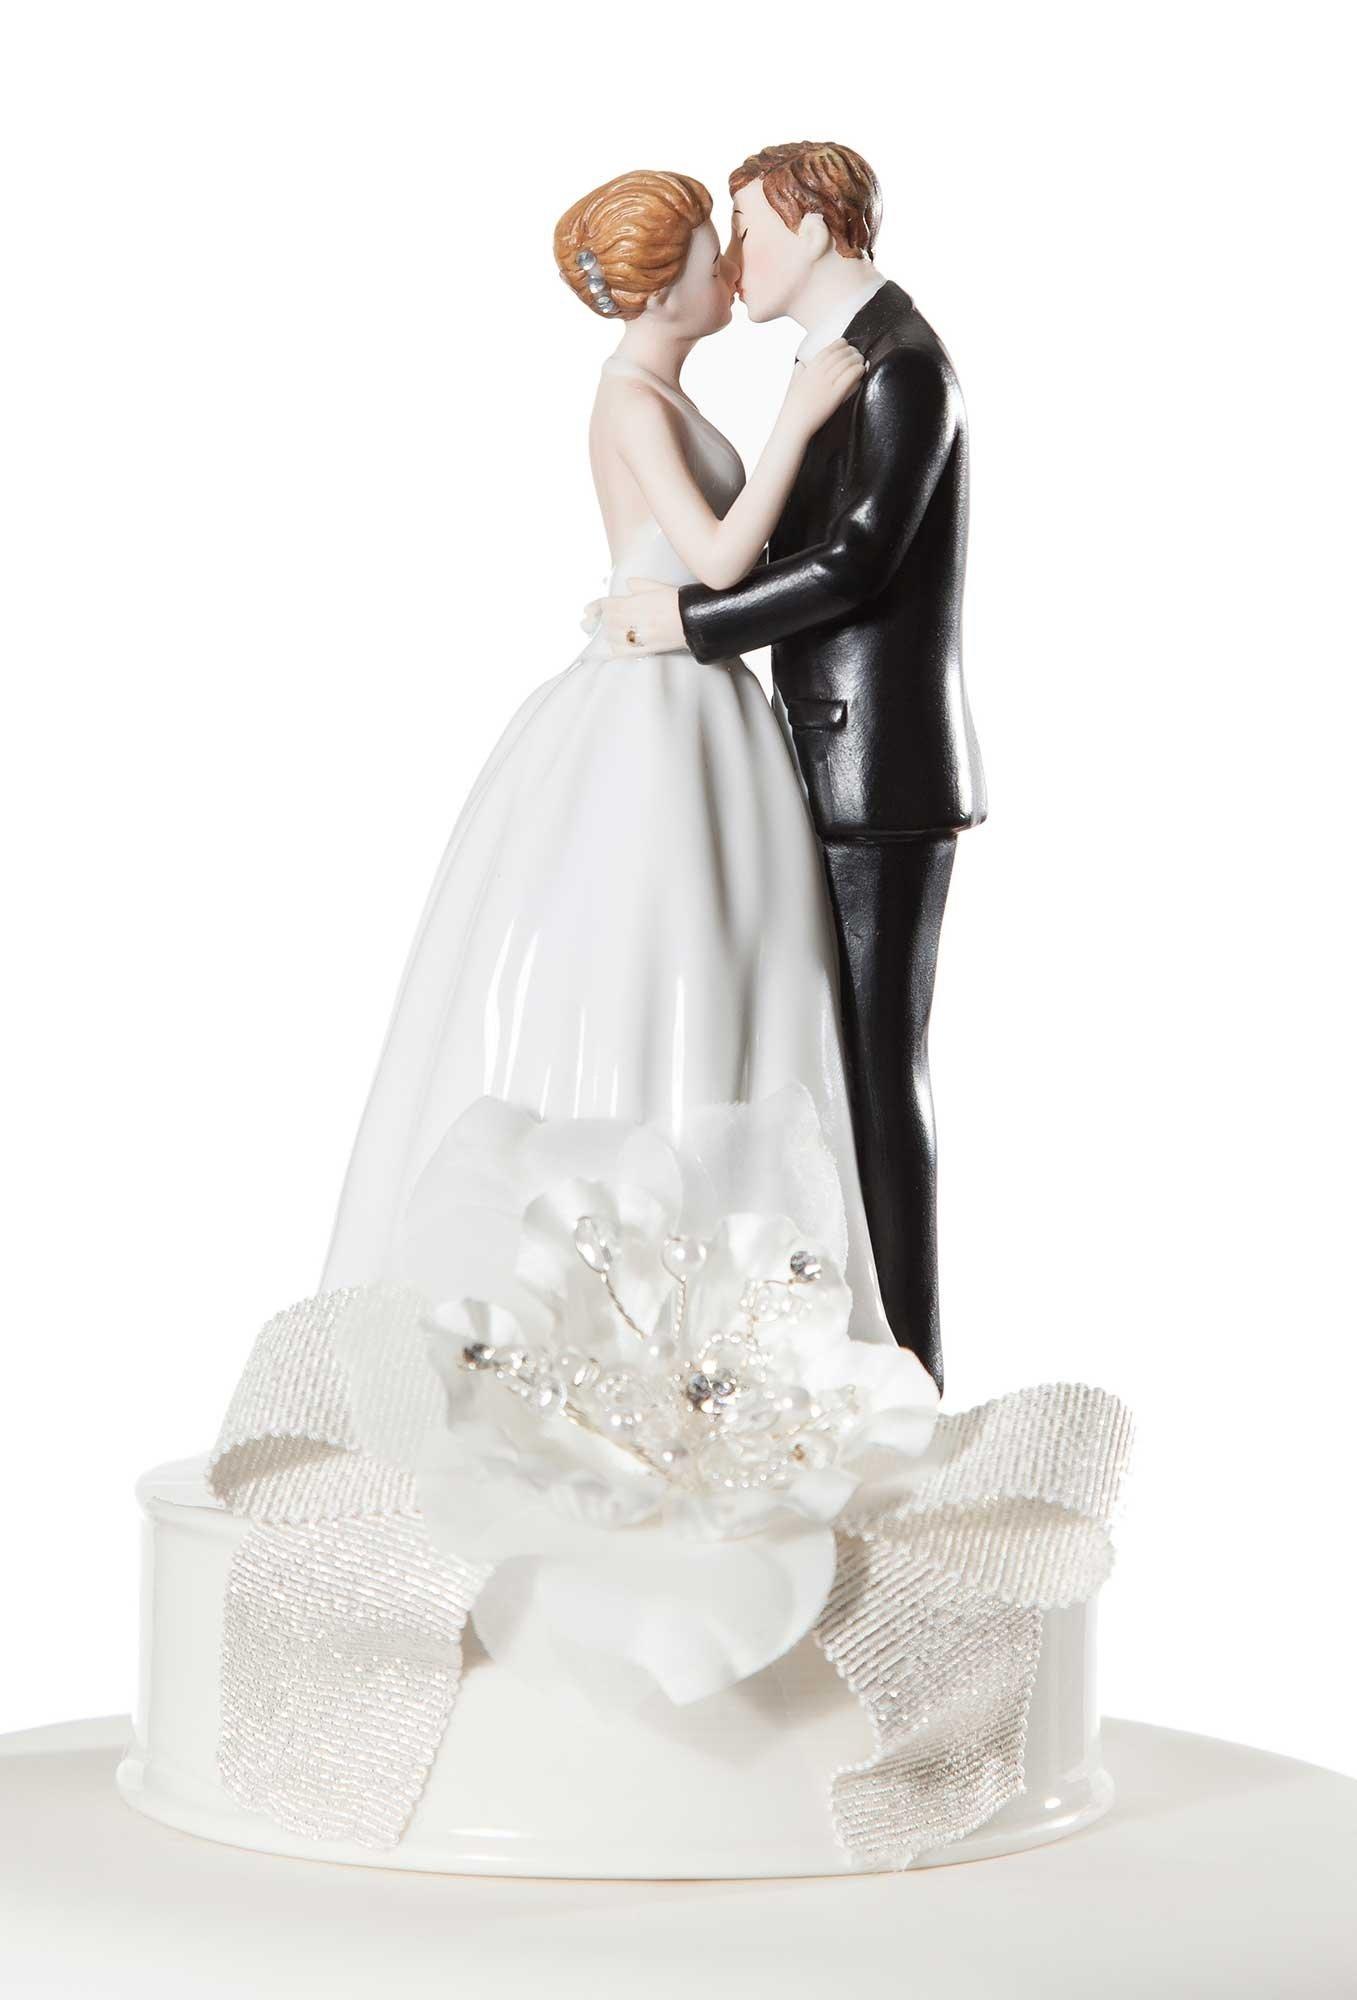 Wedding Collectibles Romance Ribbon Accent Cake Topper - White Ribbon